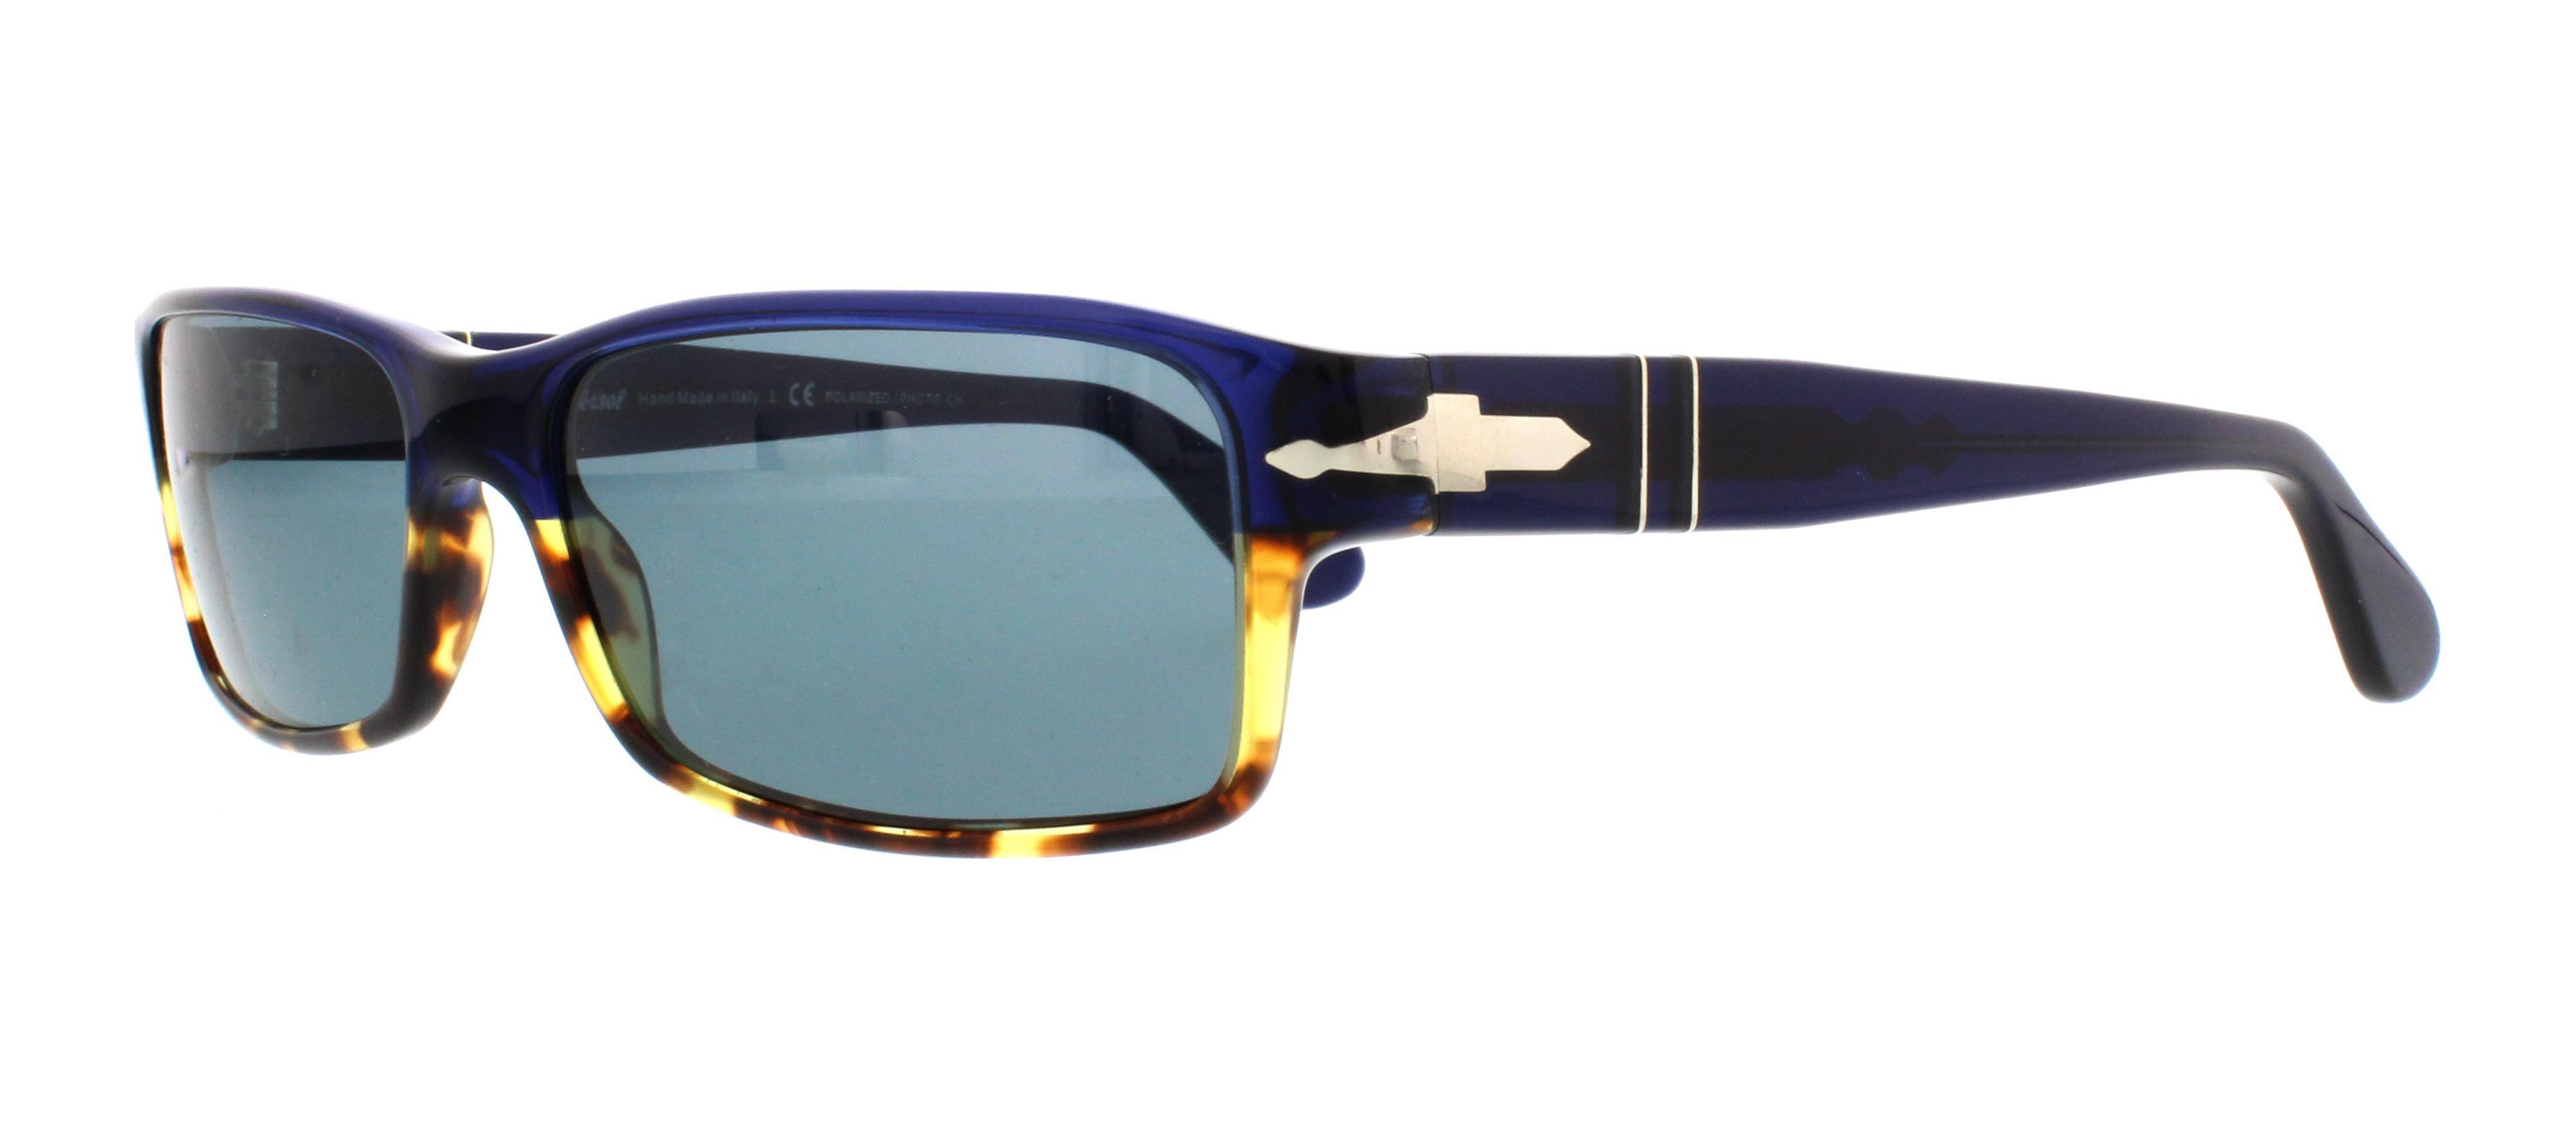 Spy Fold/havana/blue 23aiXI